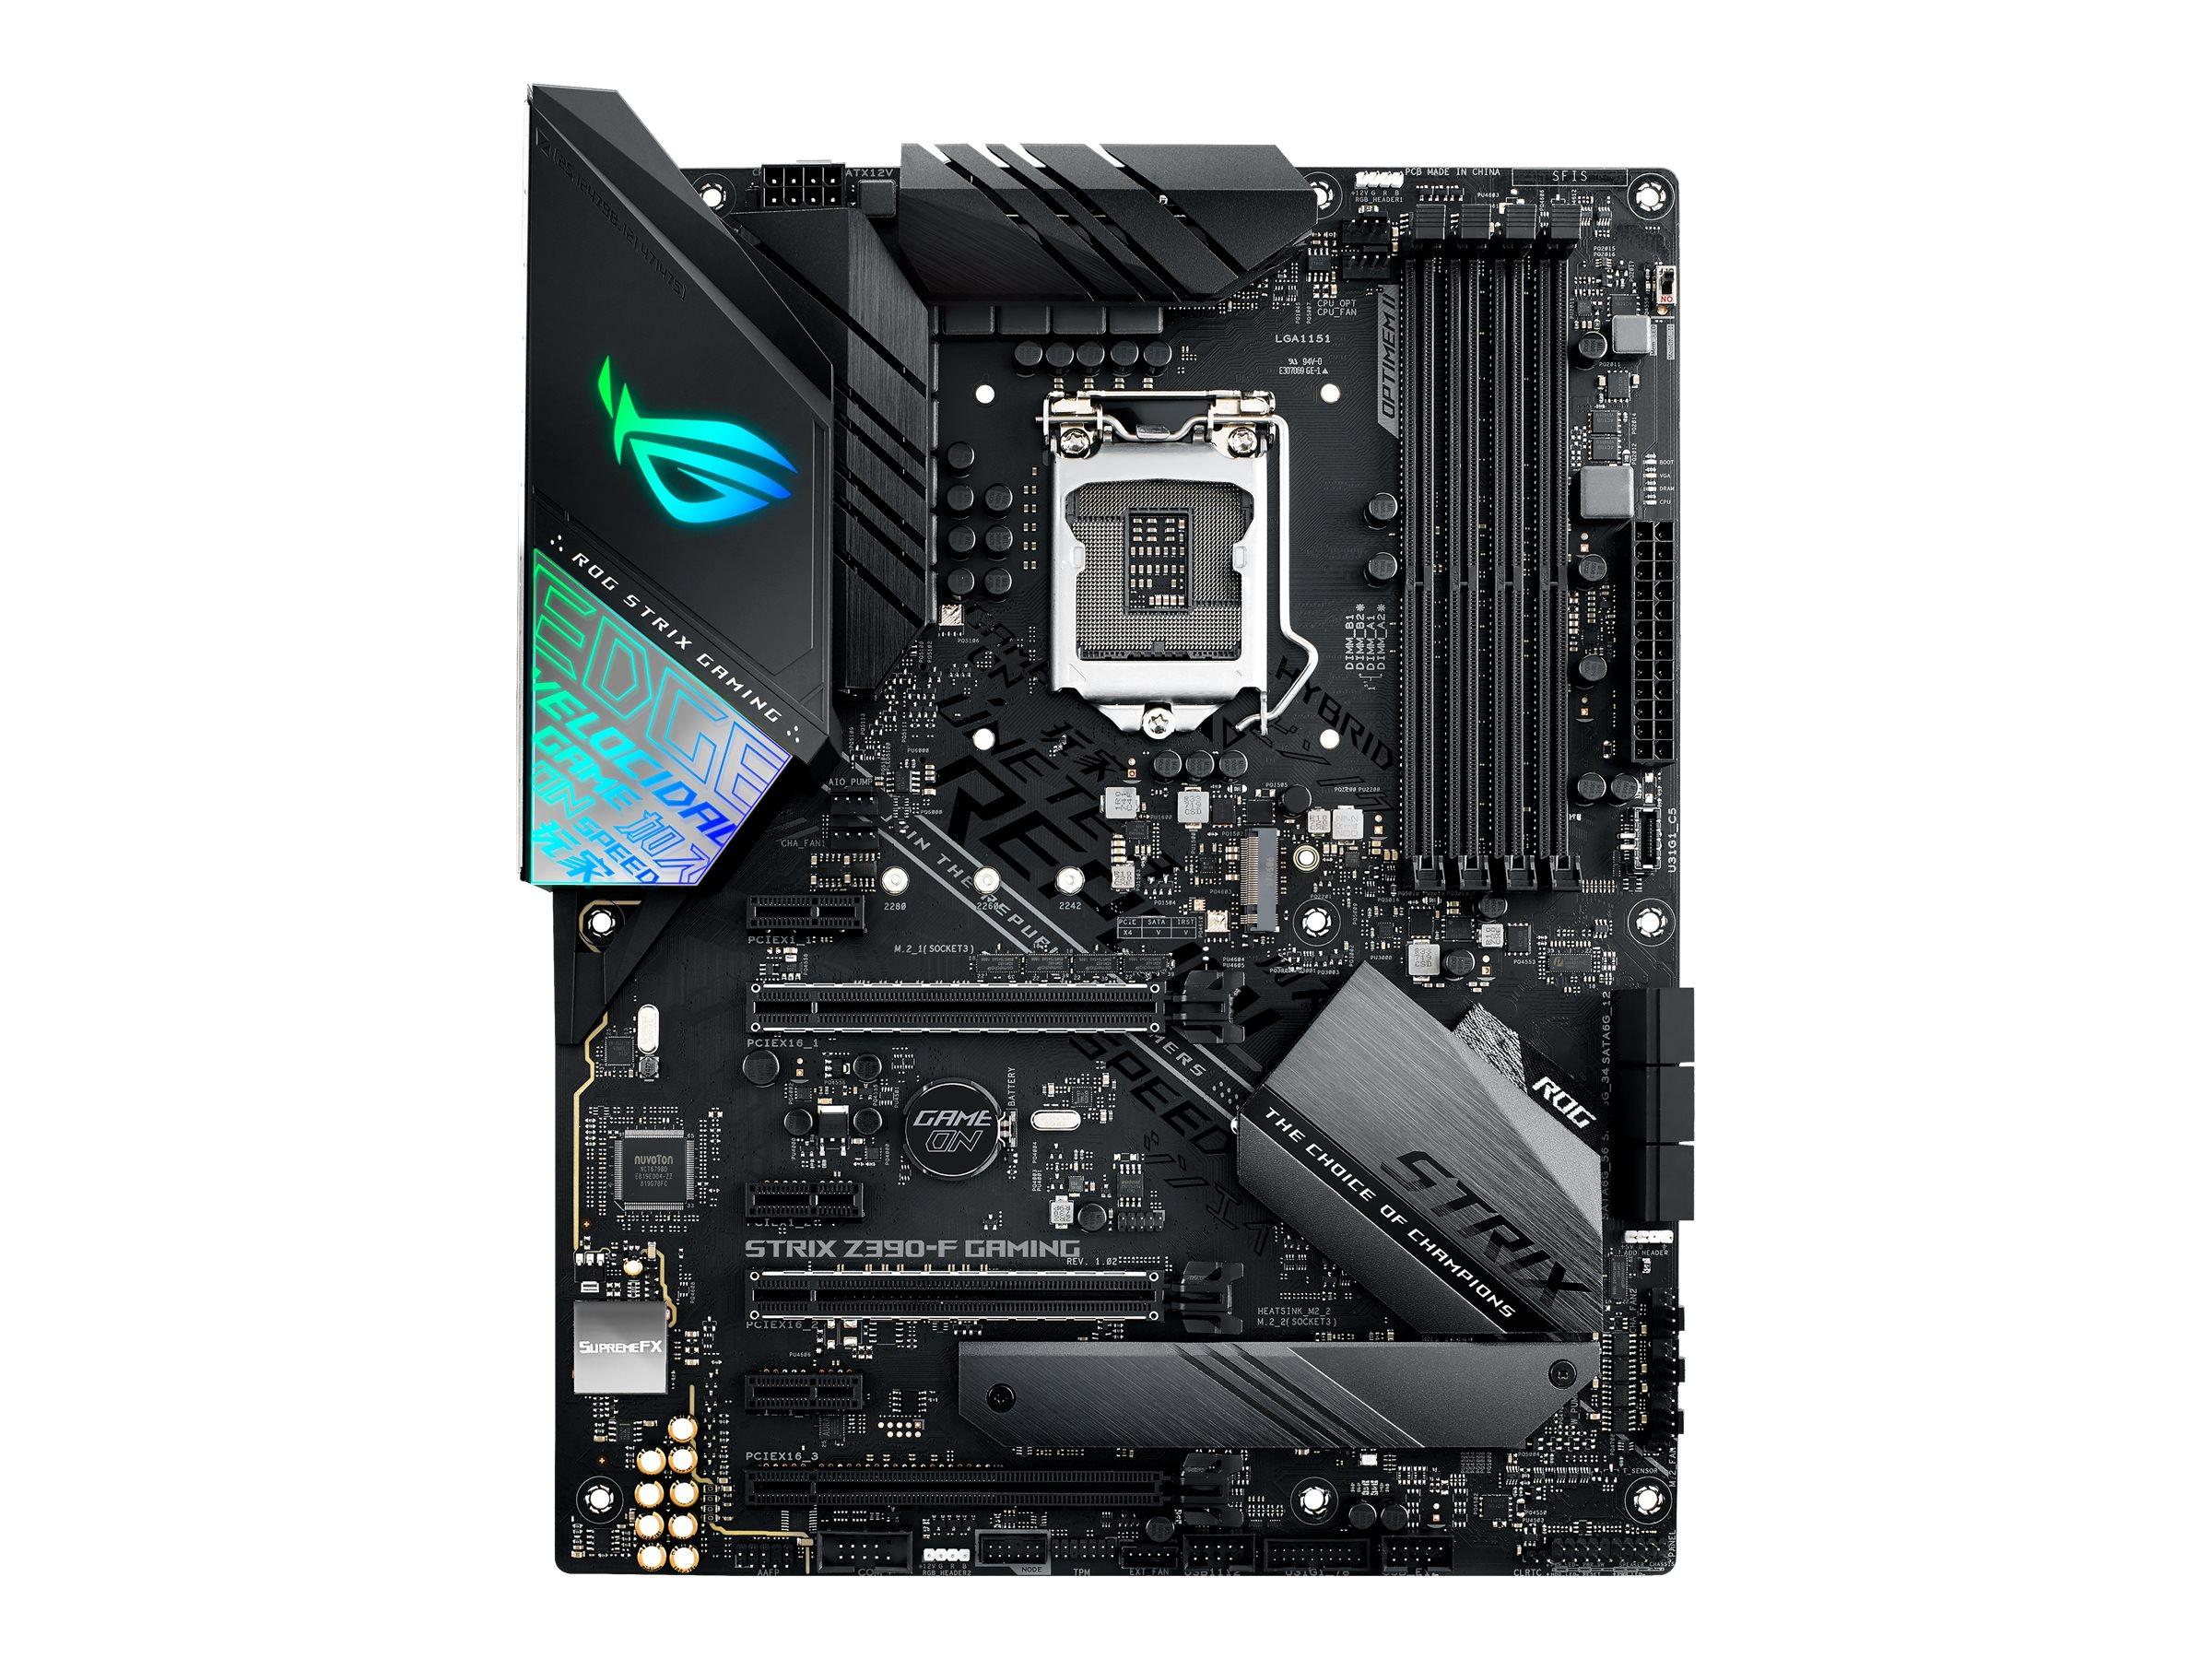 ASUS ROG STRIX Z390-F GAMING - Motherboard - ATX - LGA1151 Socket - Z390 - USB 3.1 Gen 1, USB-C Gen2, USB 3.1 Gen 2, USB-C Gen1